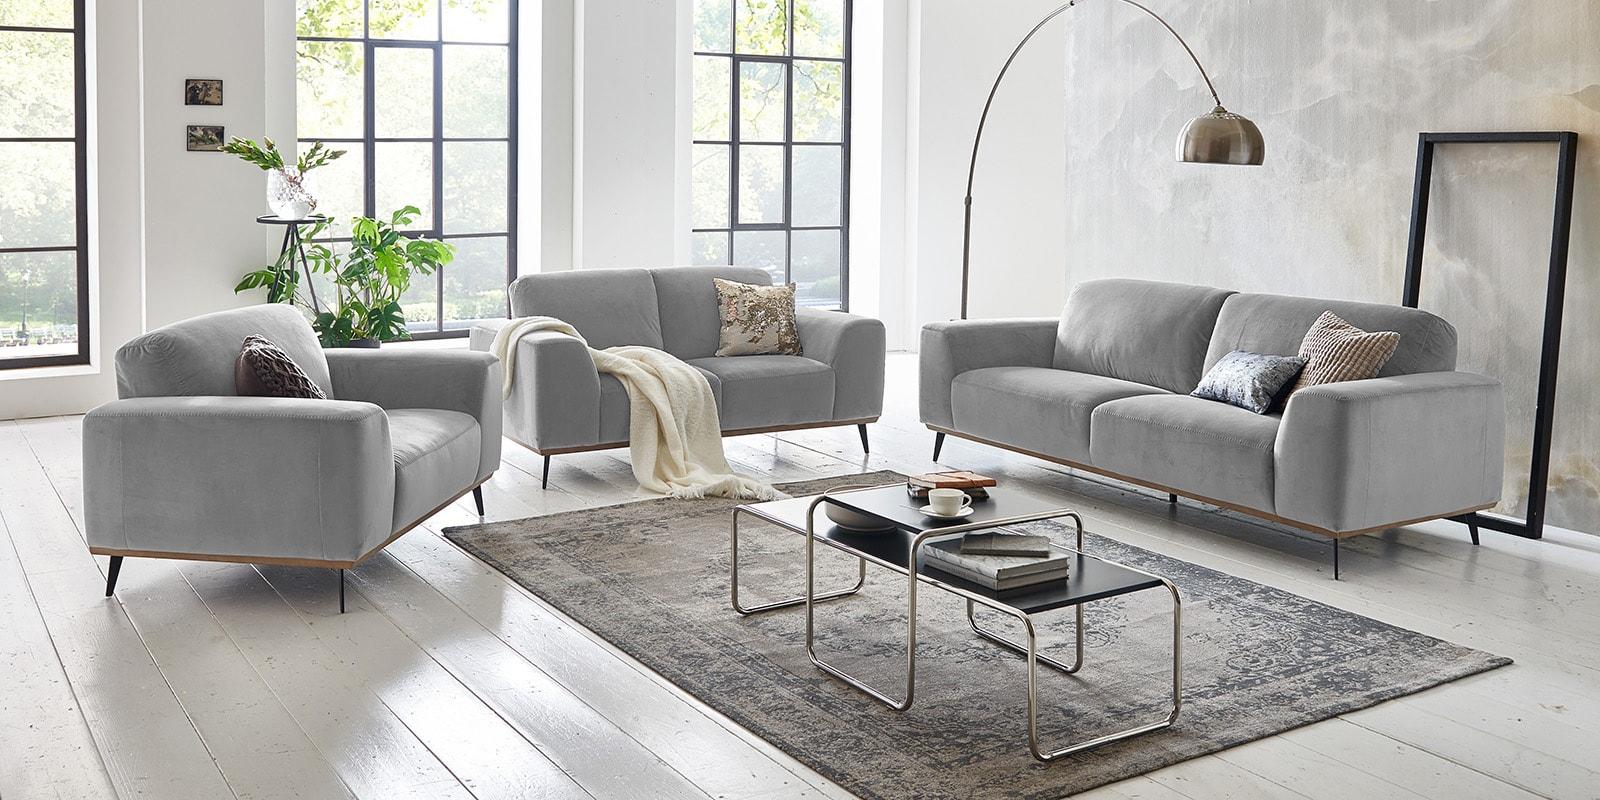 Moebella24 - 3-2-1-Sitzer - Sofa - Barcelona - Samt - Grau - Skandinavisches - Design - Punto - cavallo - Nähte